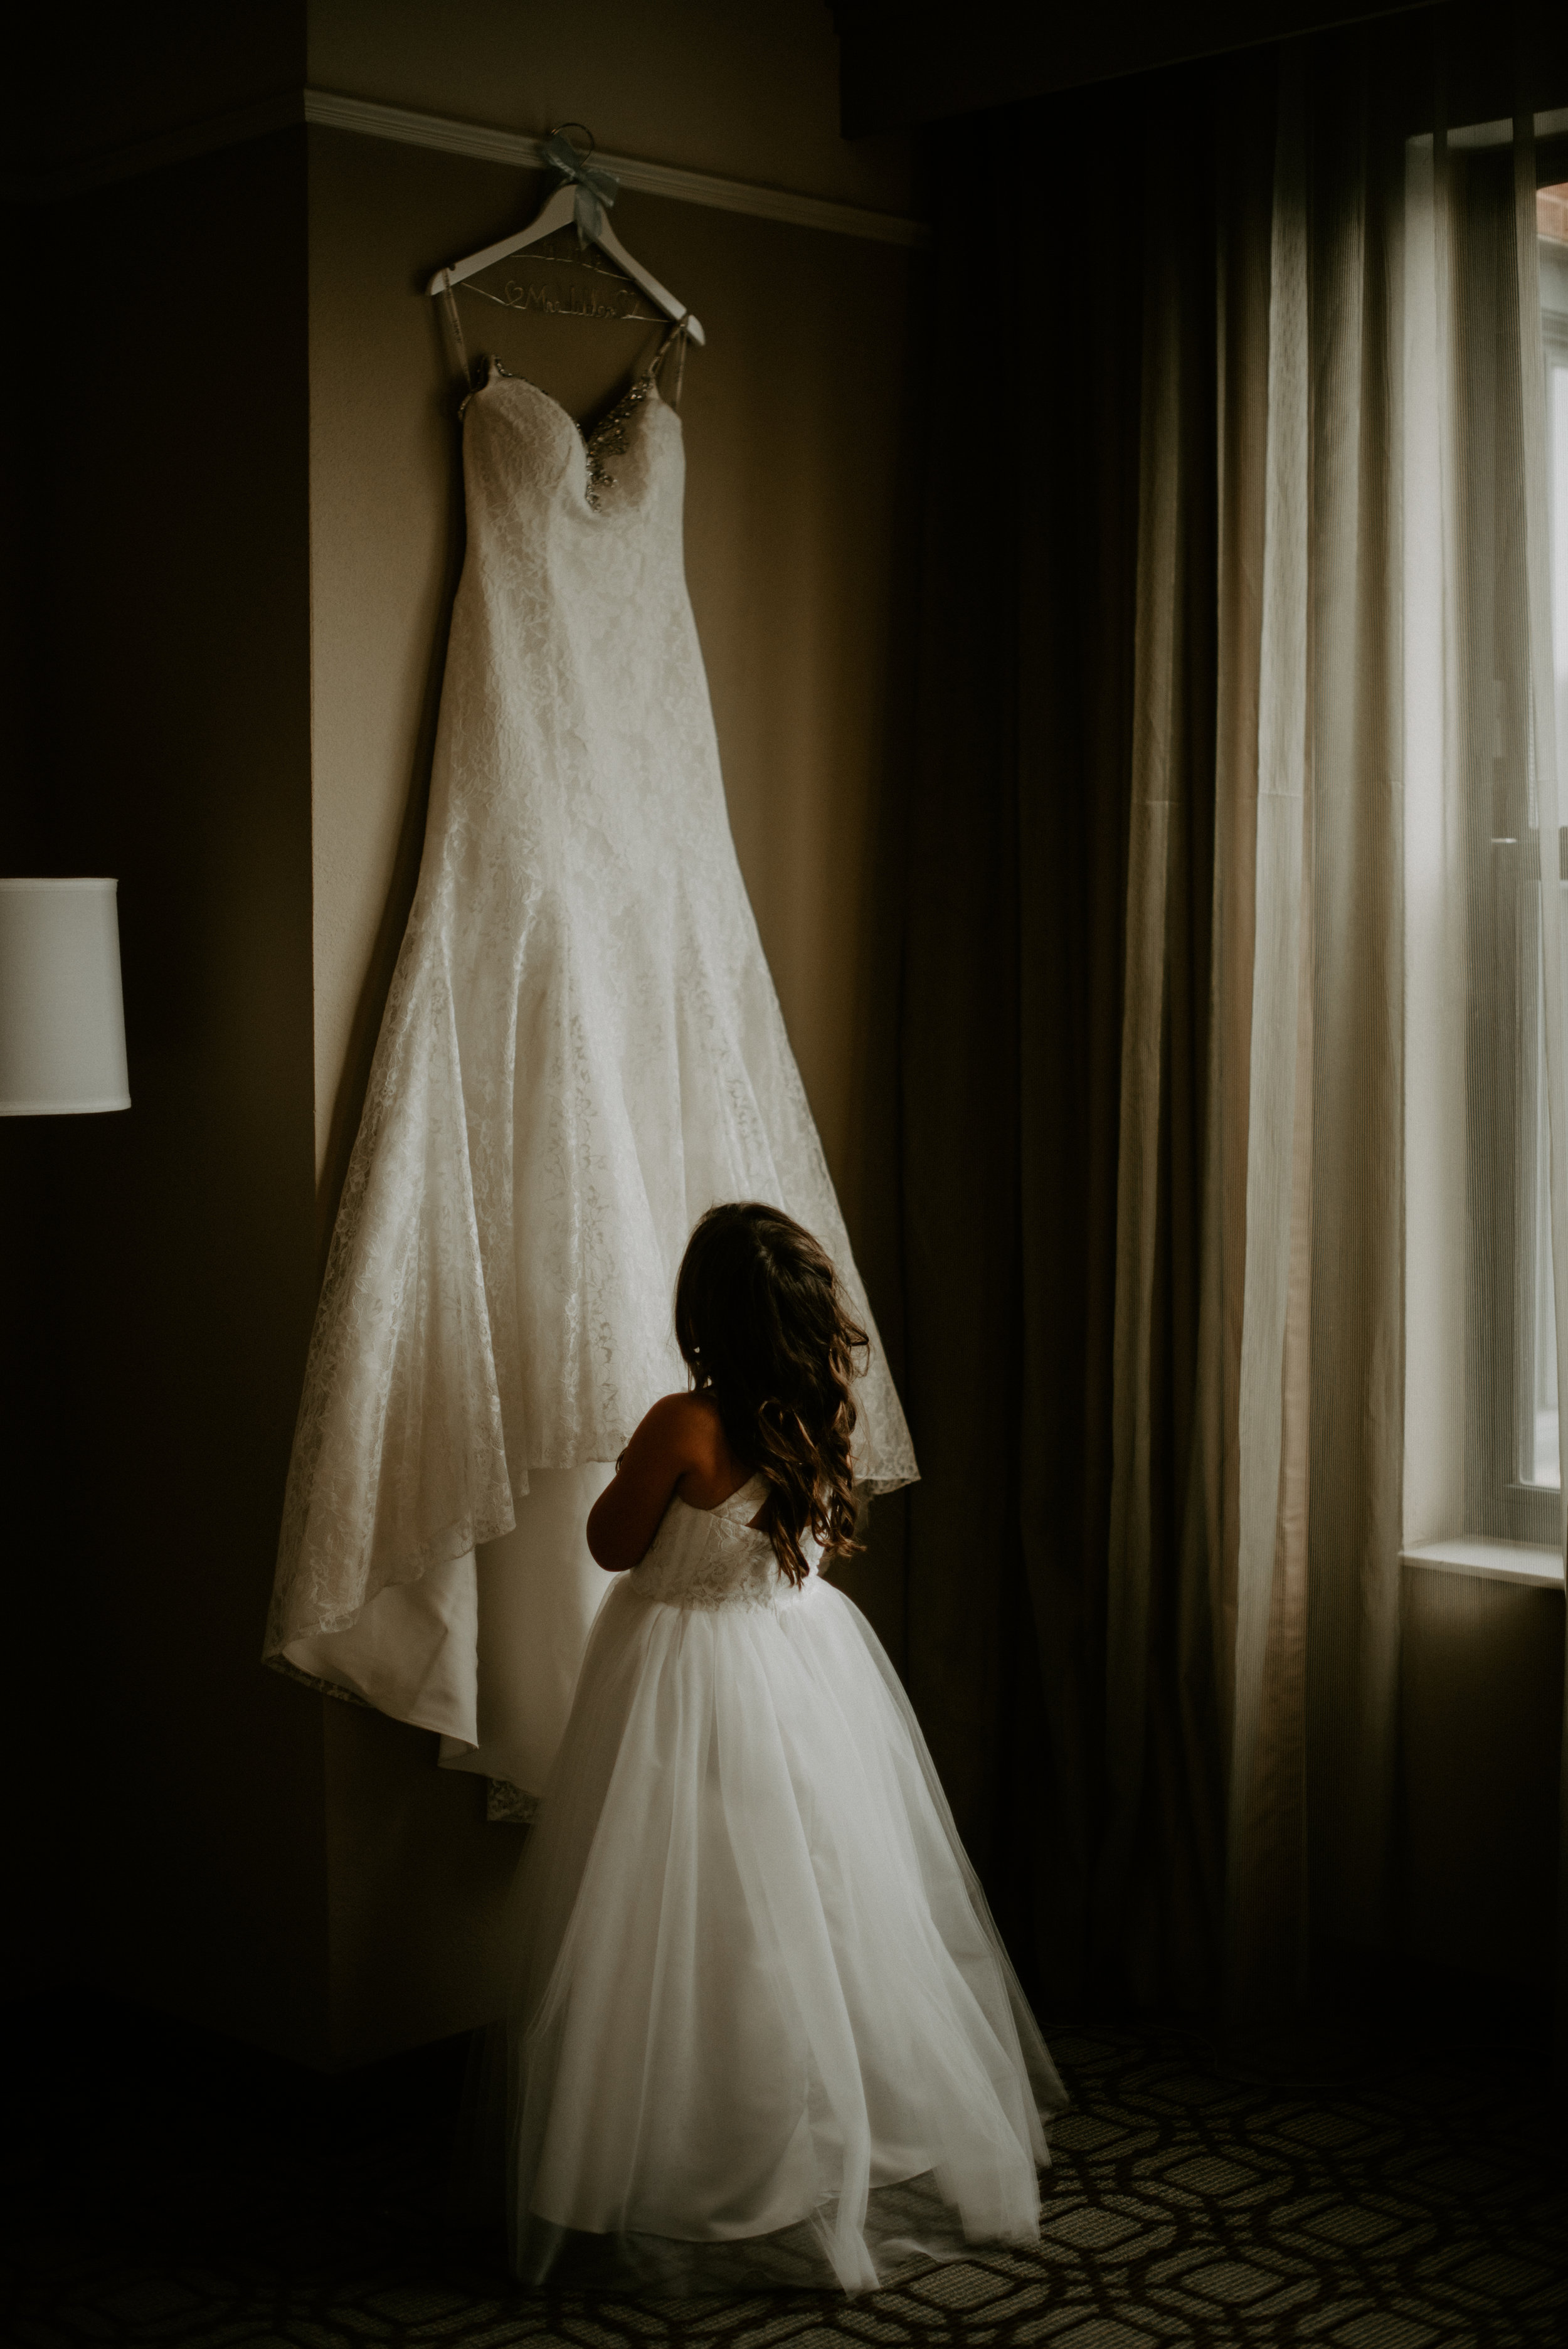 savannah-bridal-shop-andrea-and-mike-evergold-photography-georgia-state-railroad-museum-wedding-savannah-wedding-florist-savannah-wedding-planner-2.jpg